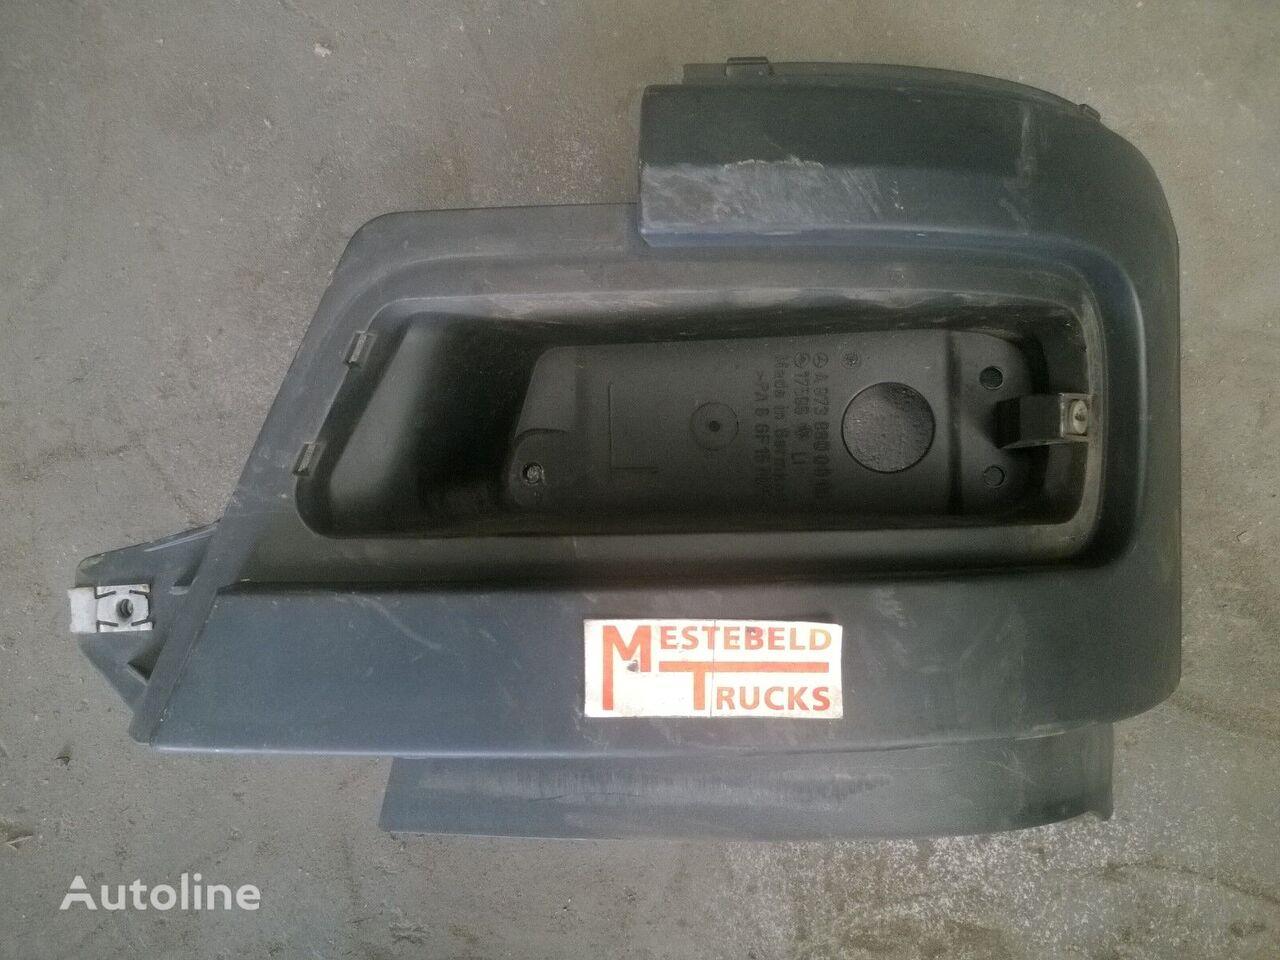 MERCEDES-BENZ front fascia for MERCEDES-BENZ Atego truck